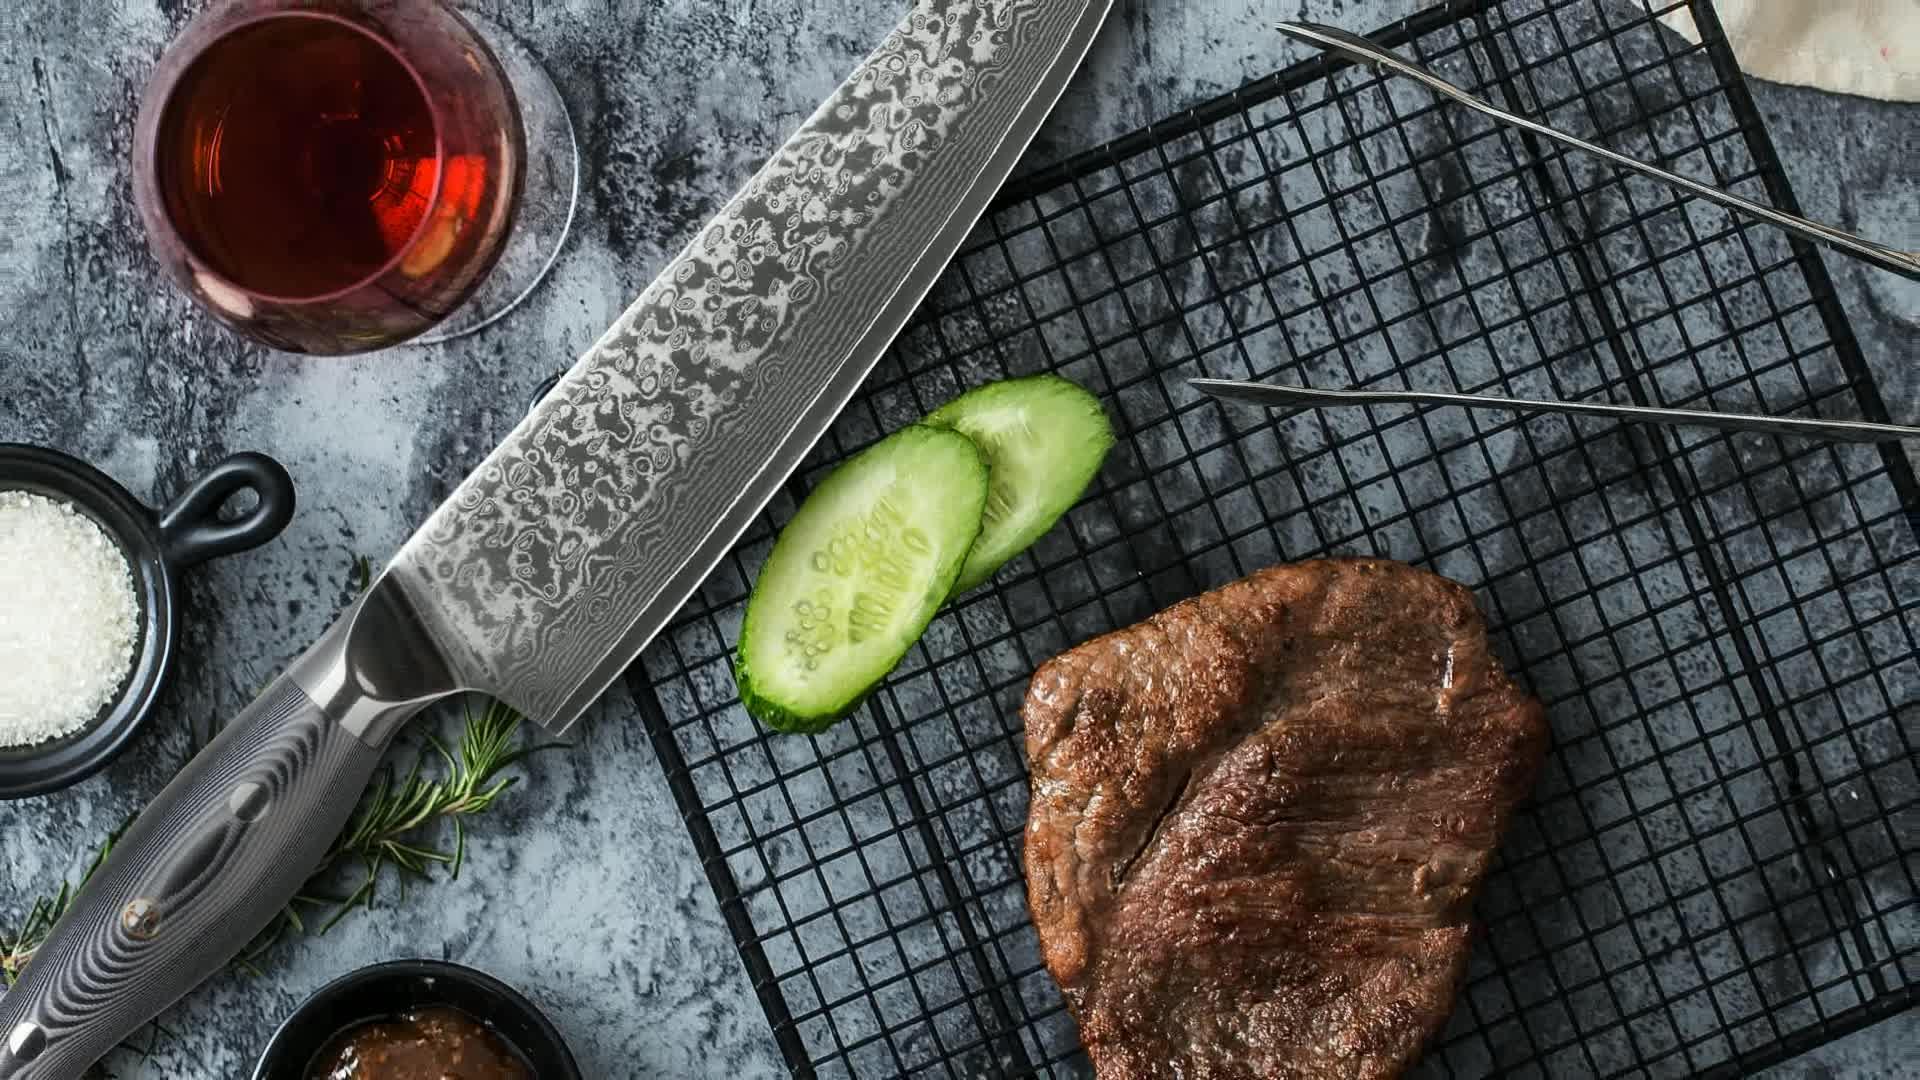 Pakistan VG10 67 layer cutting damascus steel kitchen tool butcher chef knife